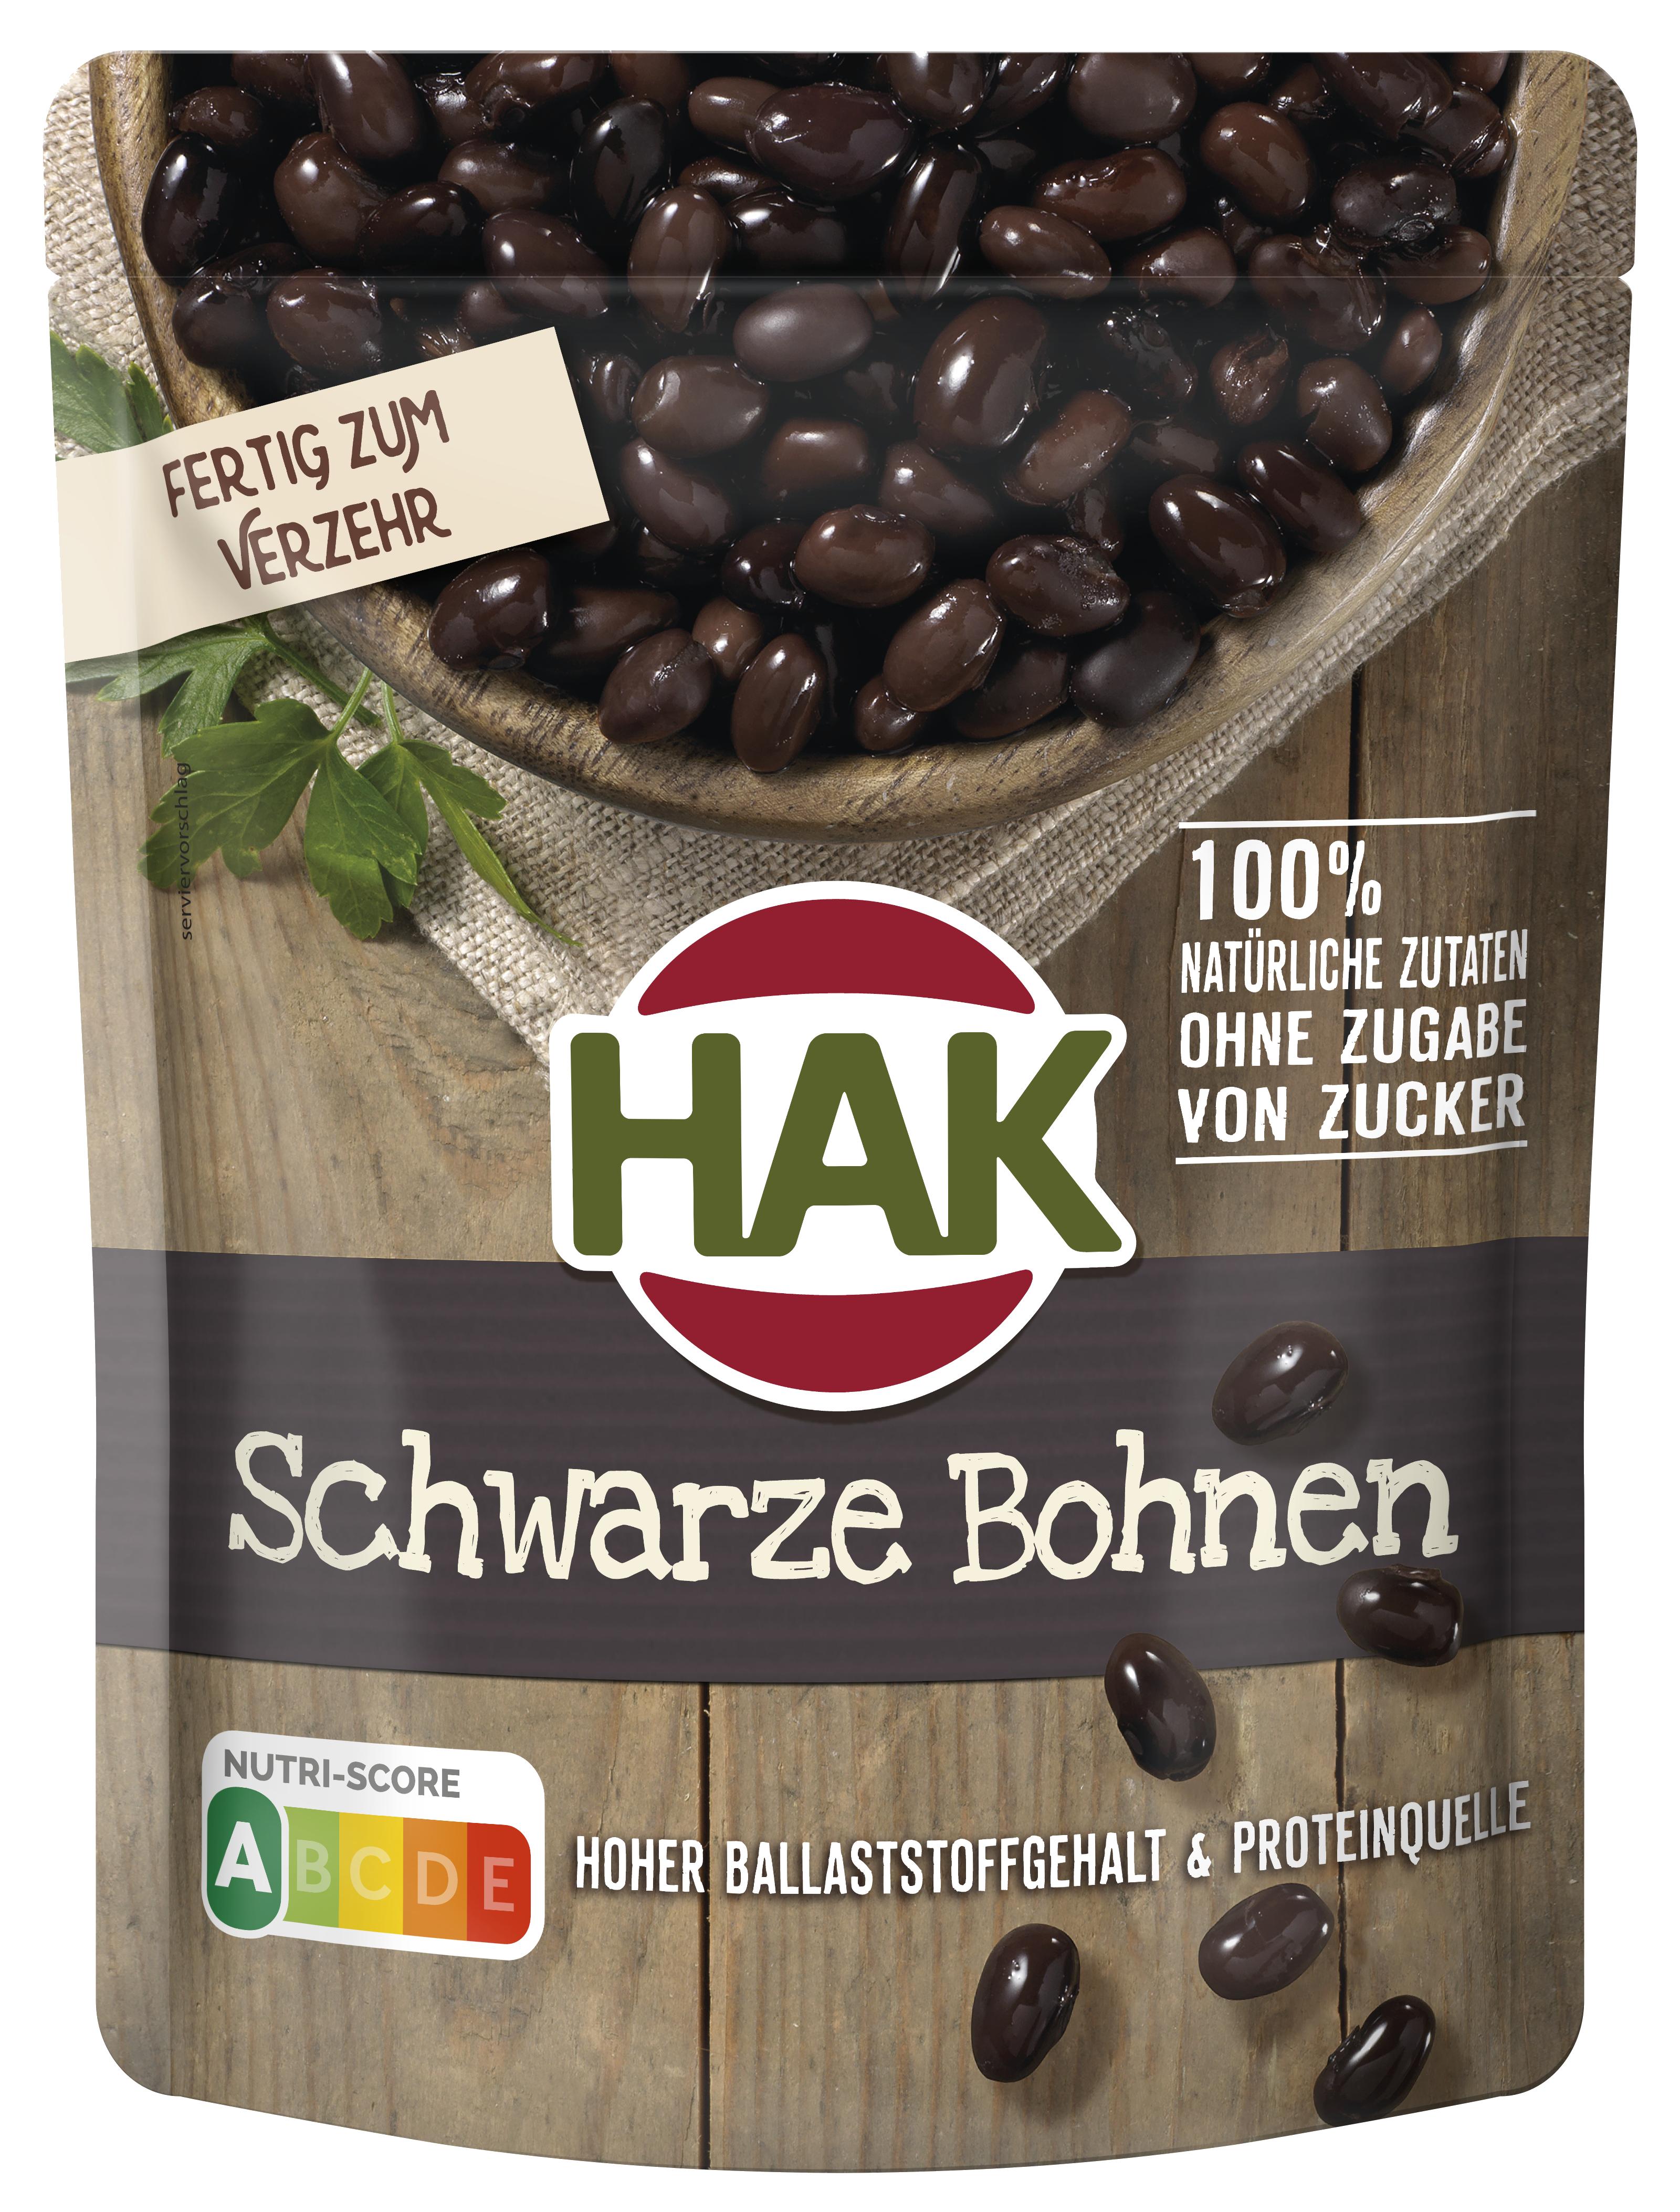 HAK Schwarze Bohnen 08720600618895 C1 N1 s01png